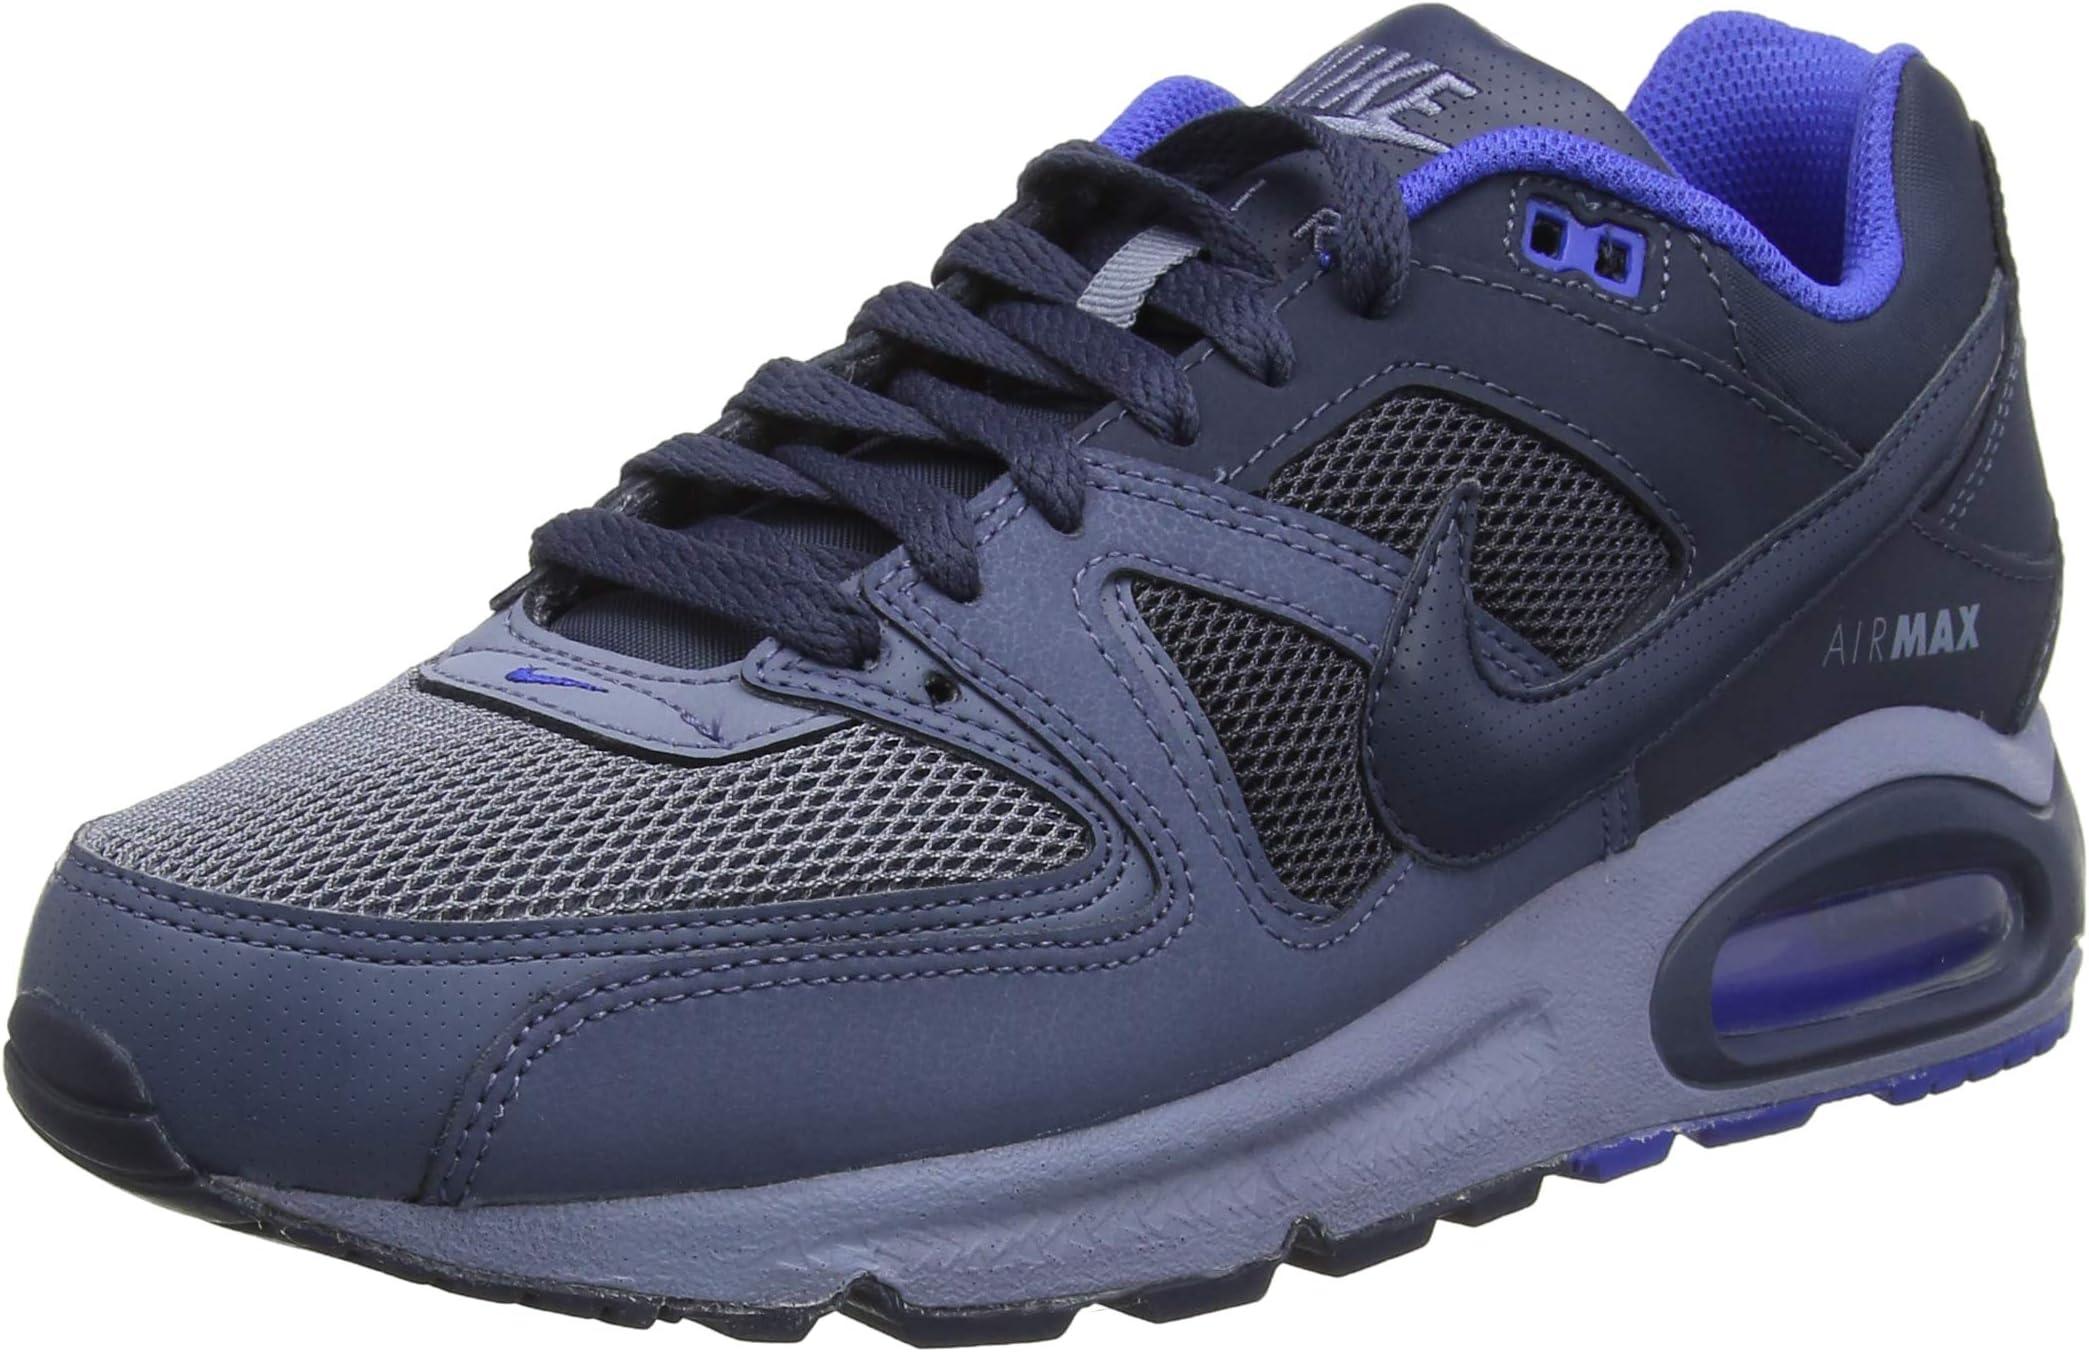 herrensneaker einkaufen auf amazon fashion  nike herren air max command sneaker, mehrfarbig